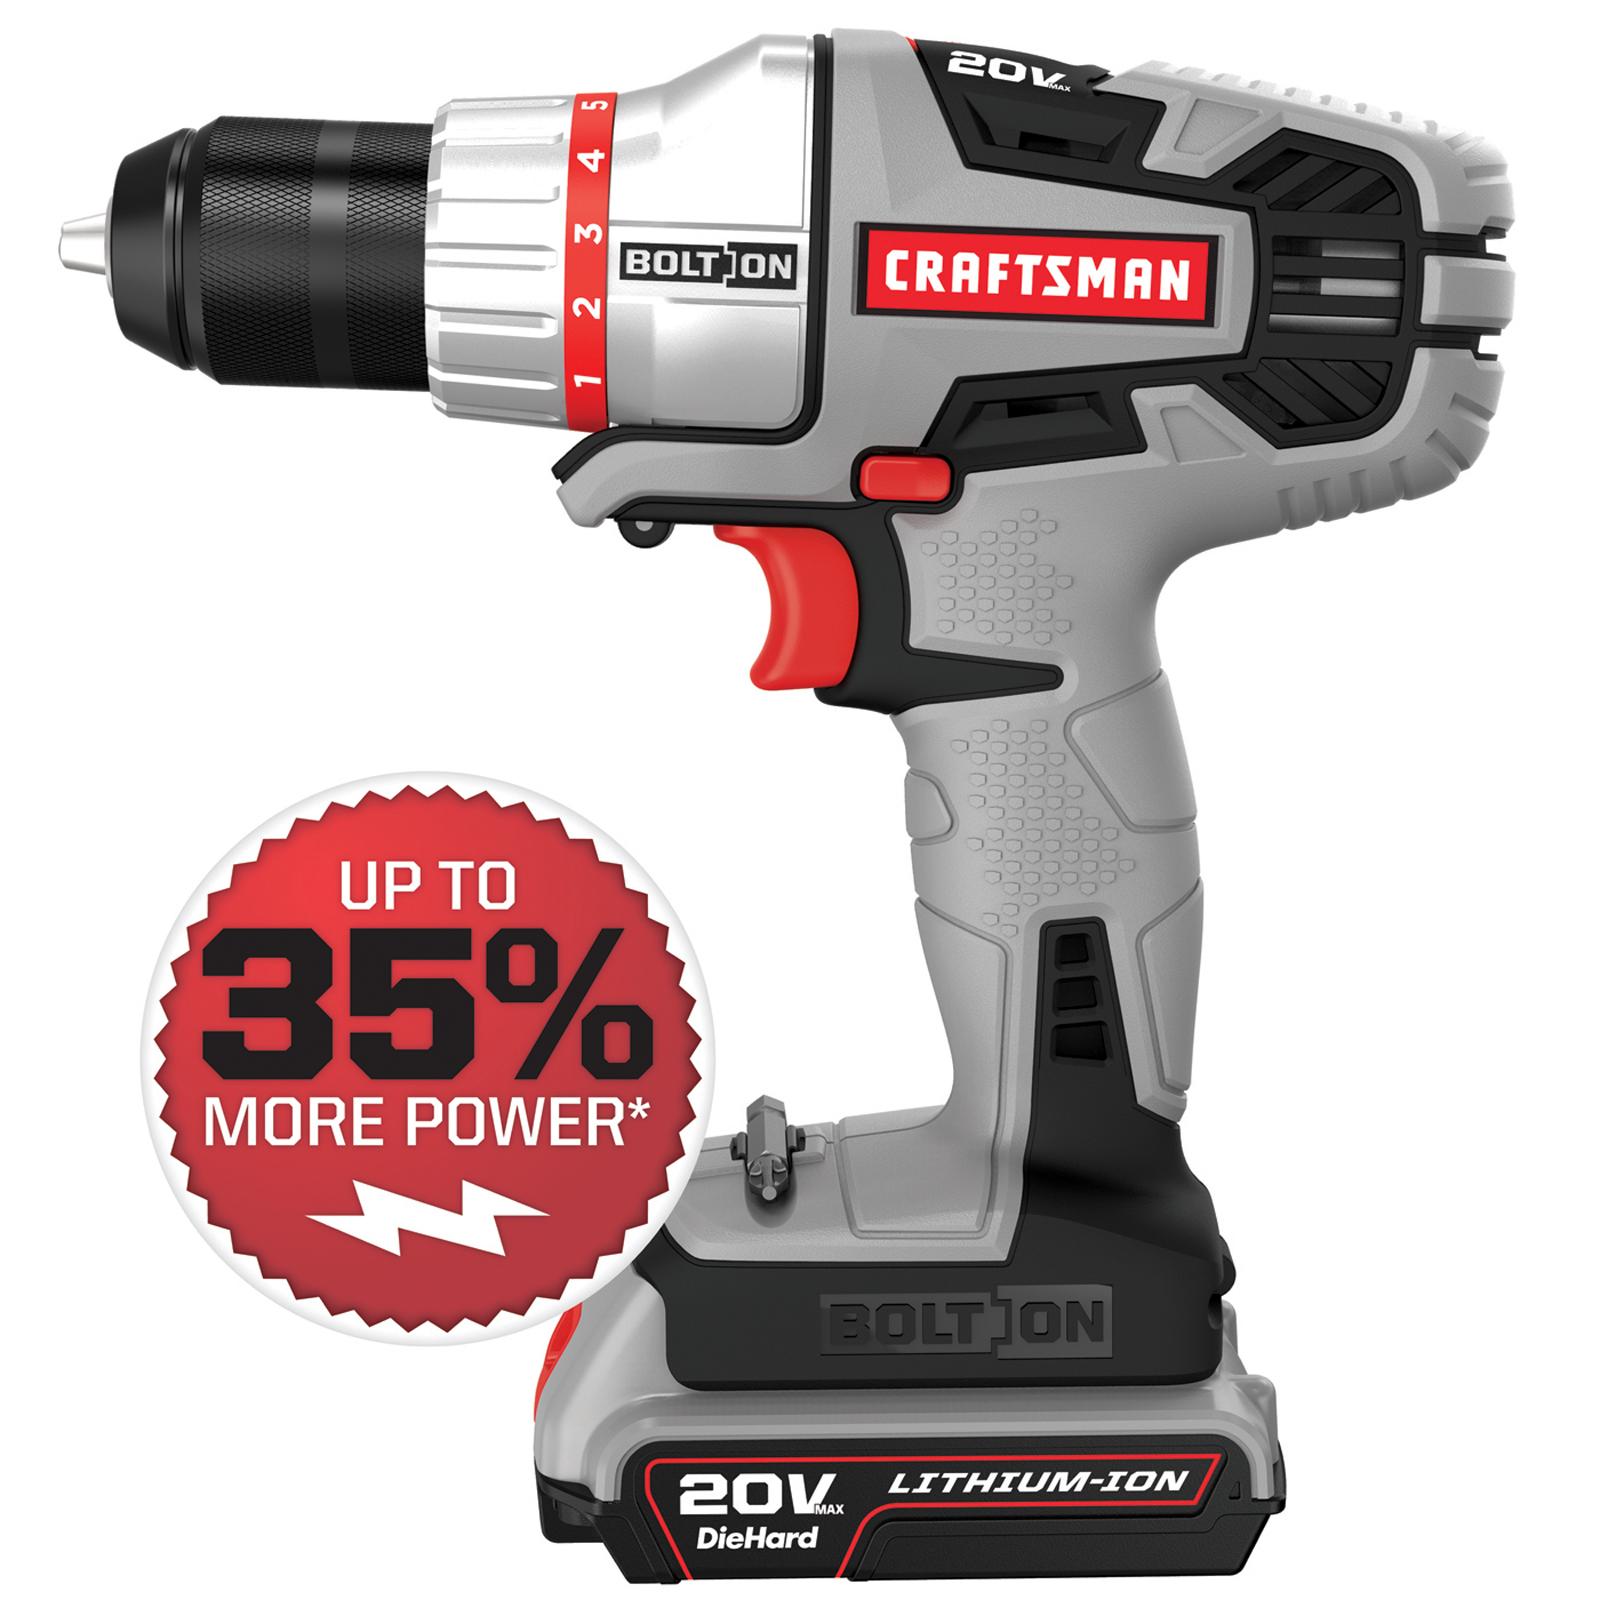 Craftsman Bolt-On ™ 20v max lithium ion drill/driver